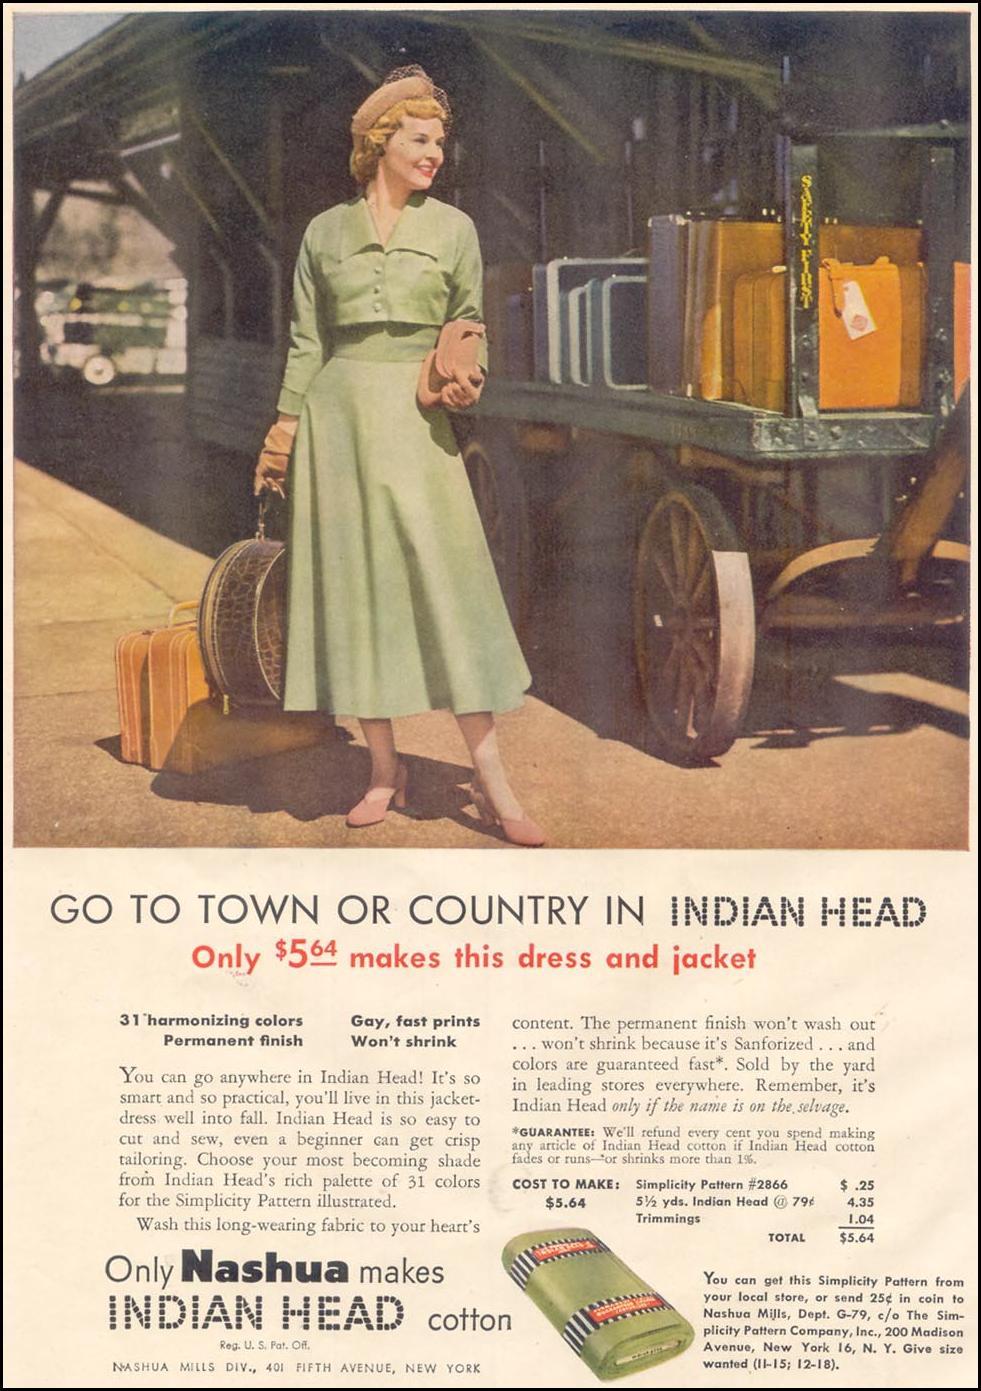 NASHUA INDIAN HEAD COTTON GOOD HOUSEKEEPING 07/01/1949